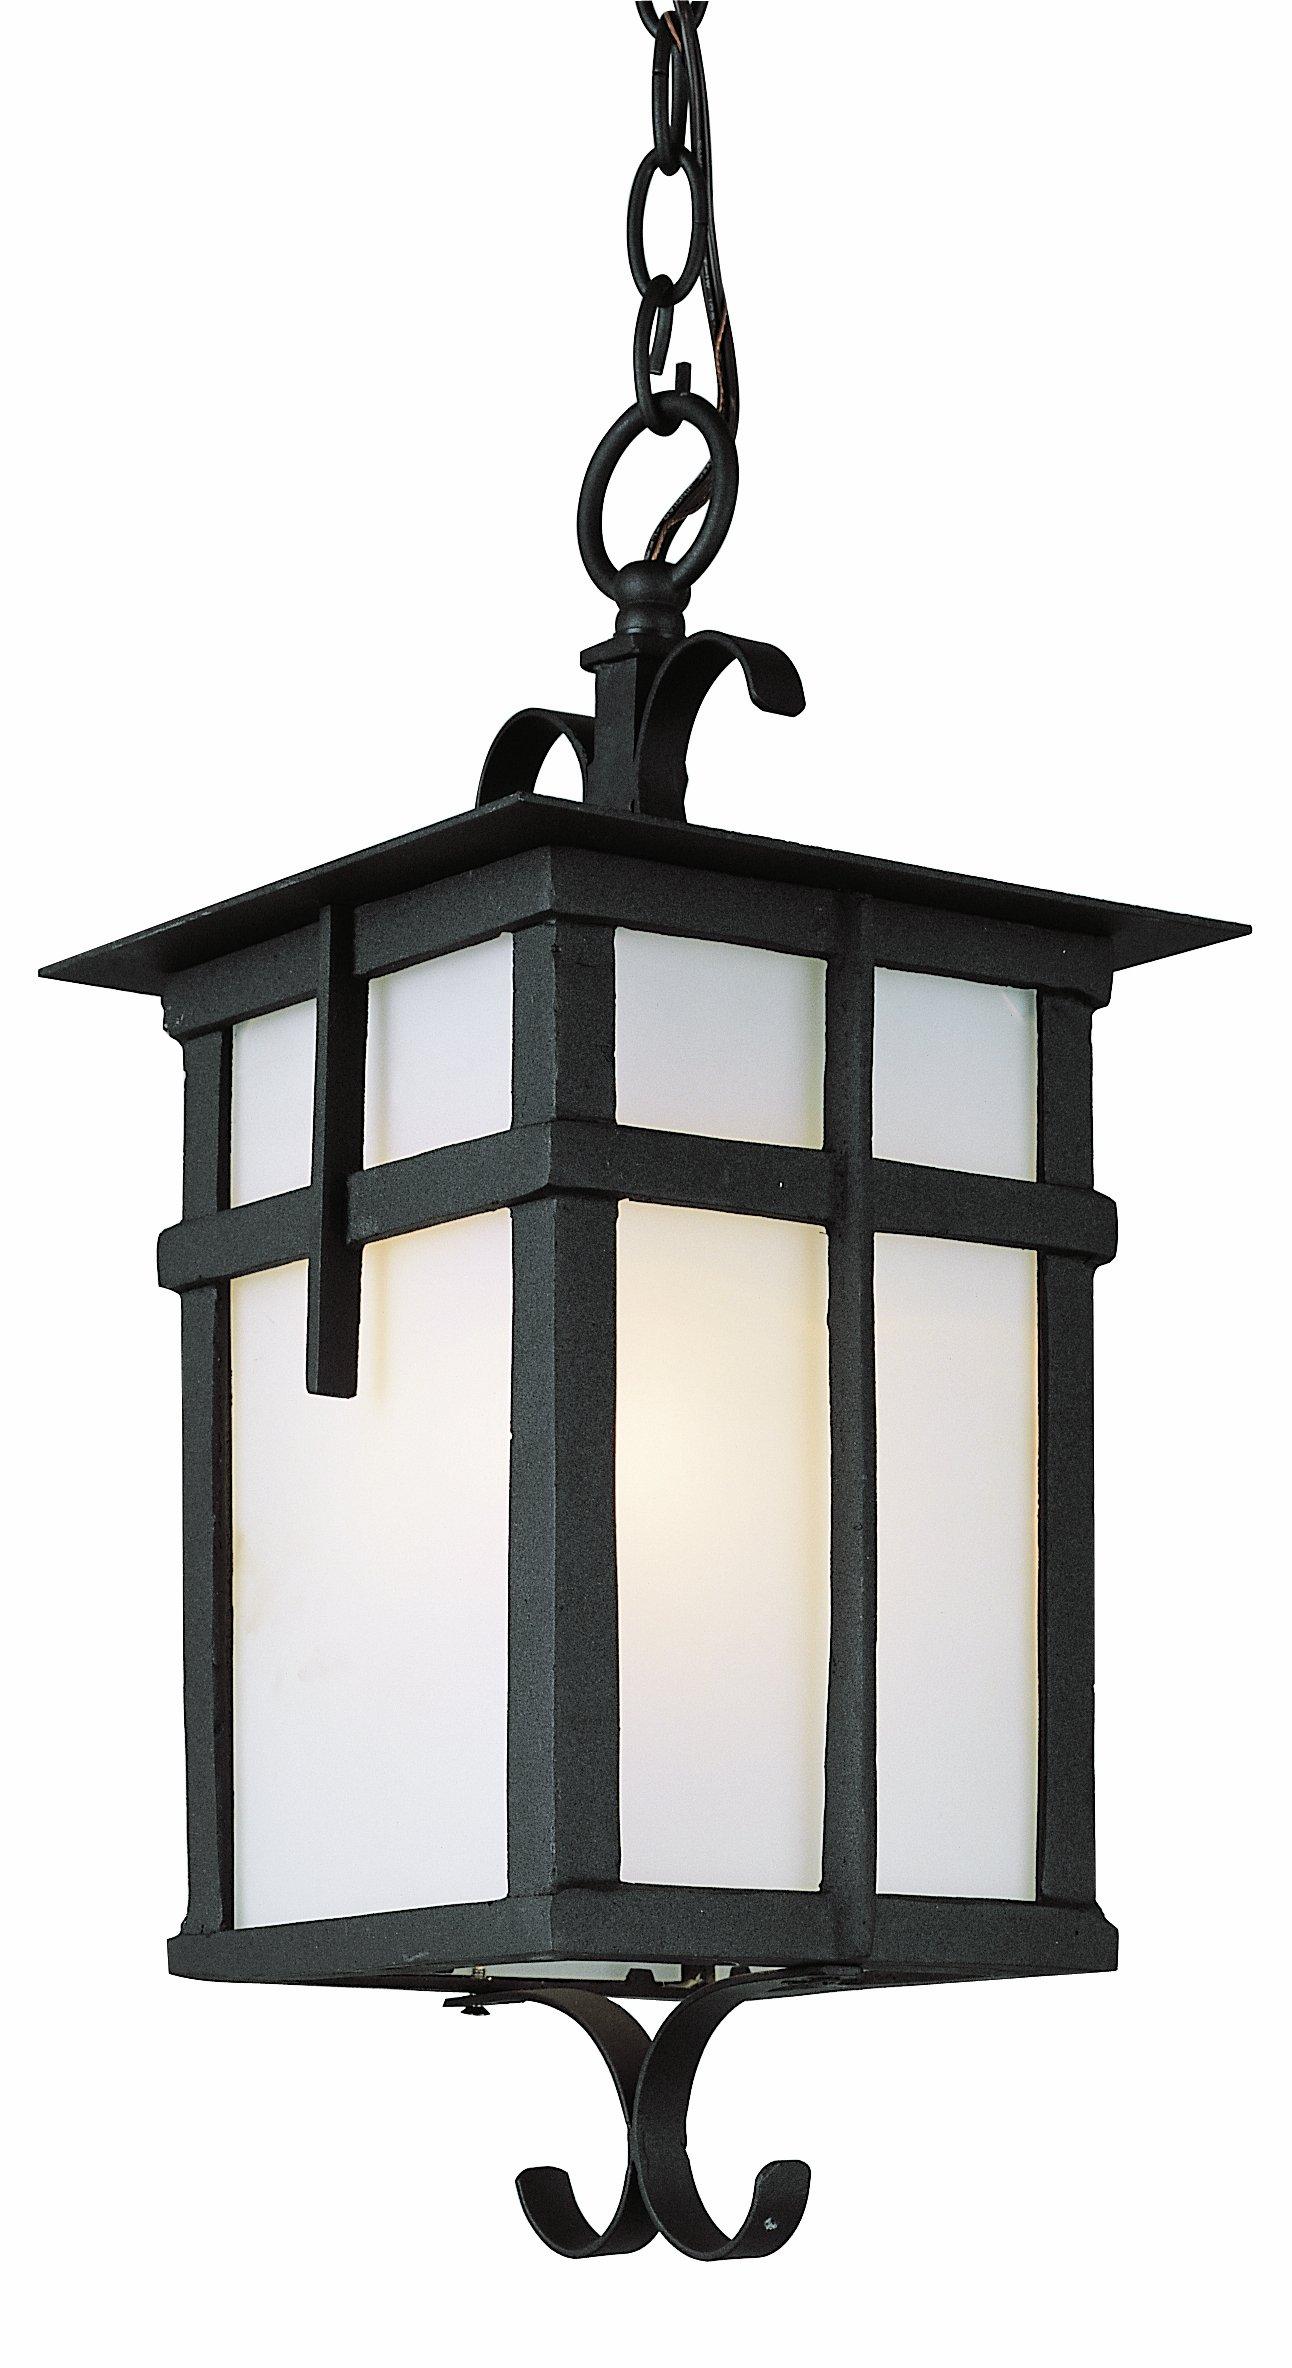 Trans Globe Lighting 5284 BK 16-Inch 1-Light Outdoor Medium Hanging Lantern, Black